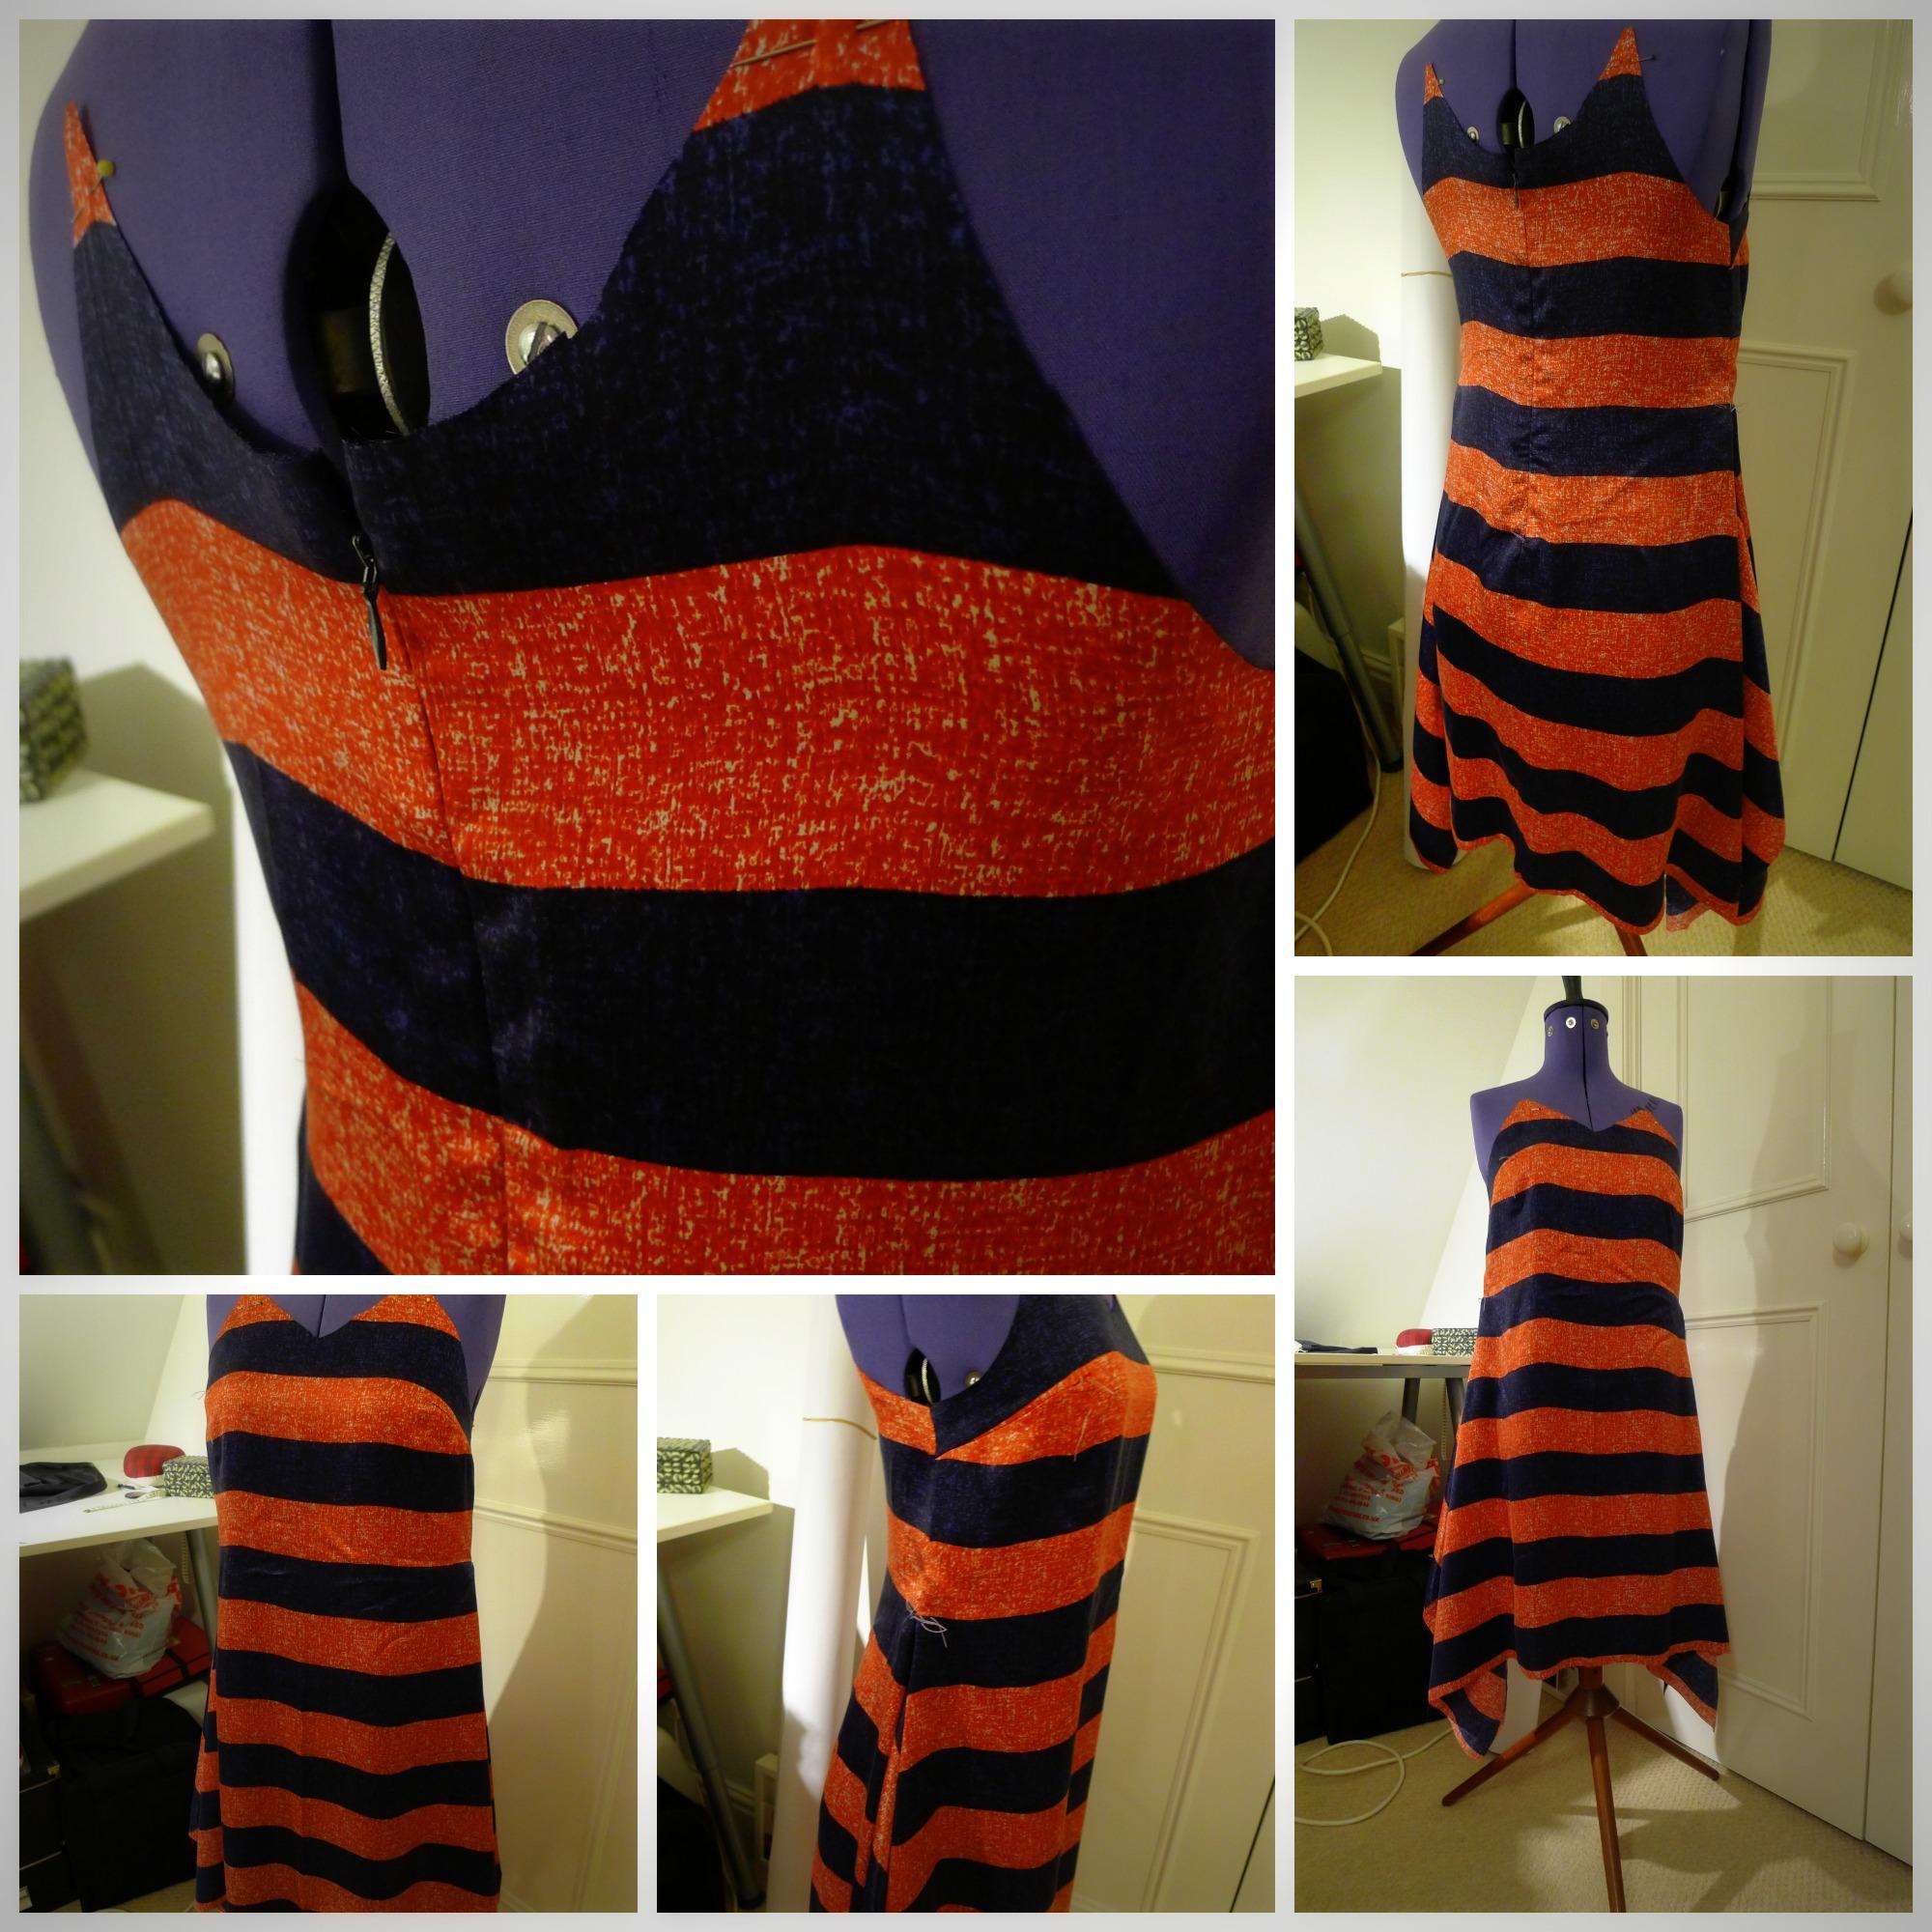 Collage handerchief dress